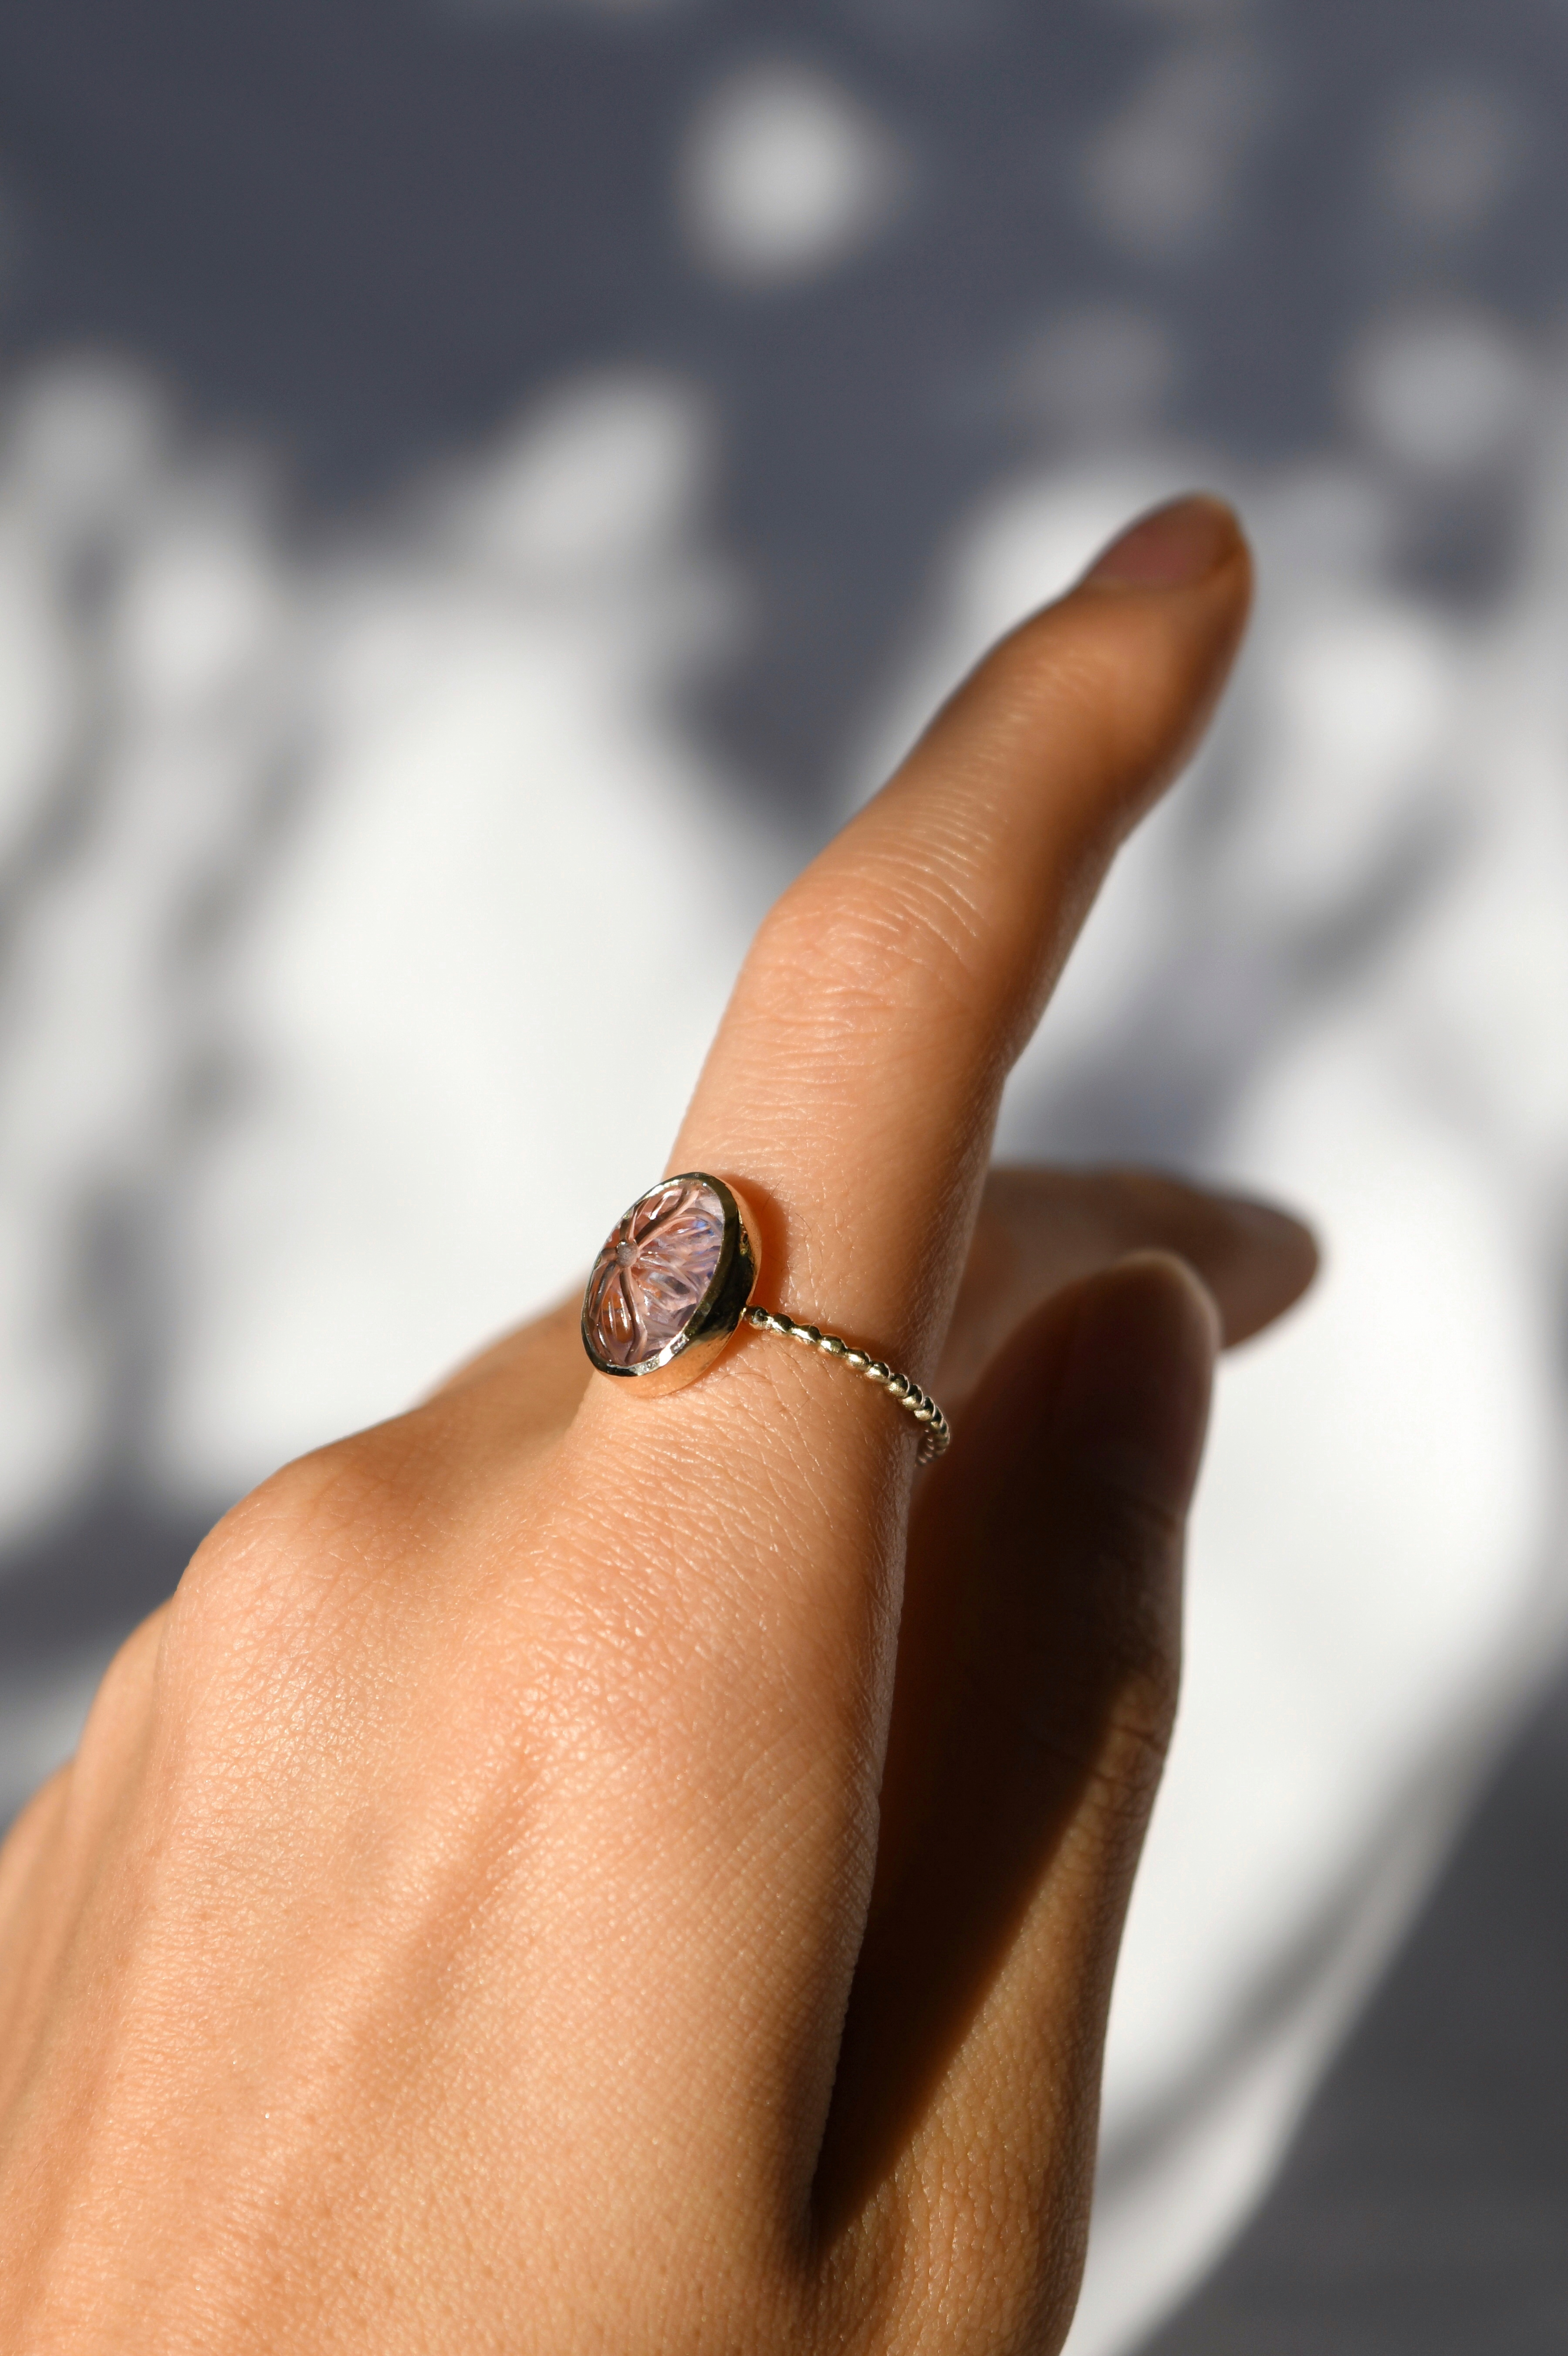 K10 Carving Pink Amethyst Ring 10金カービングピンクアメシストリング